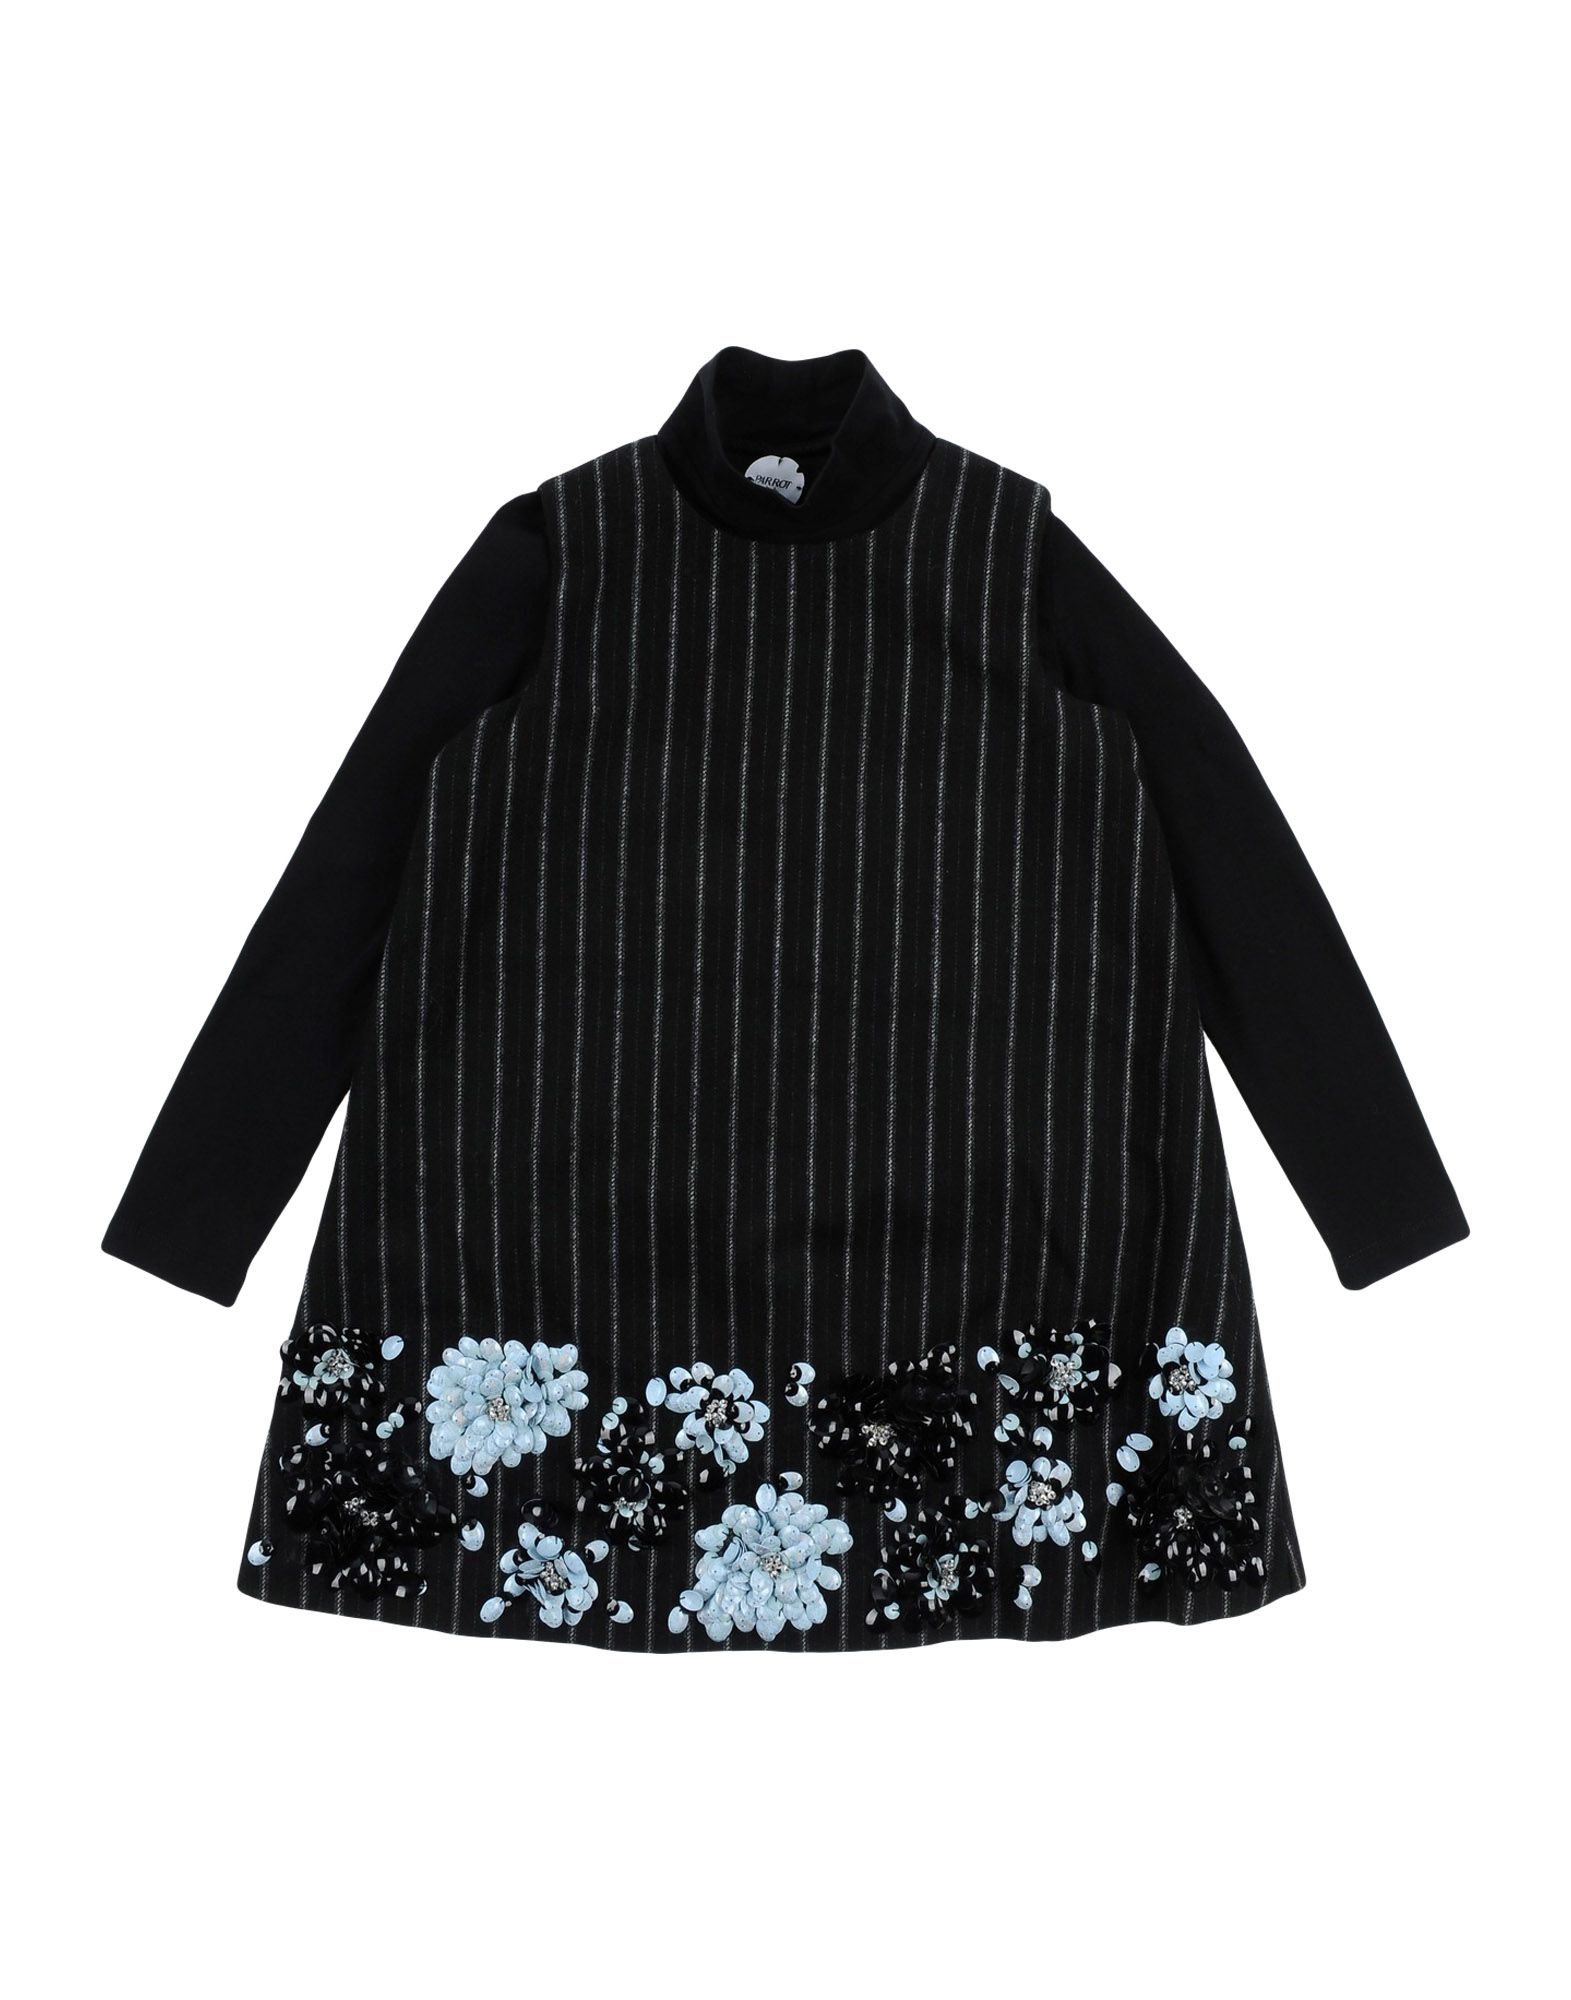 PARROT Dress in Black